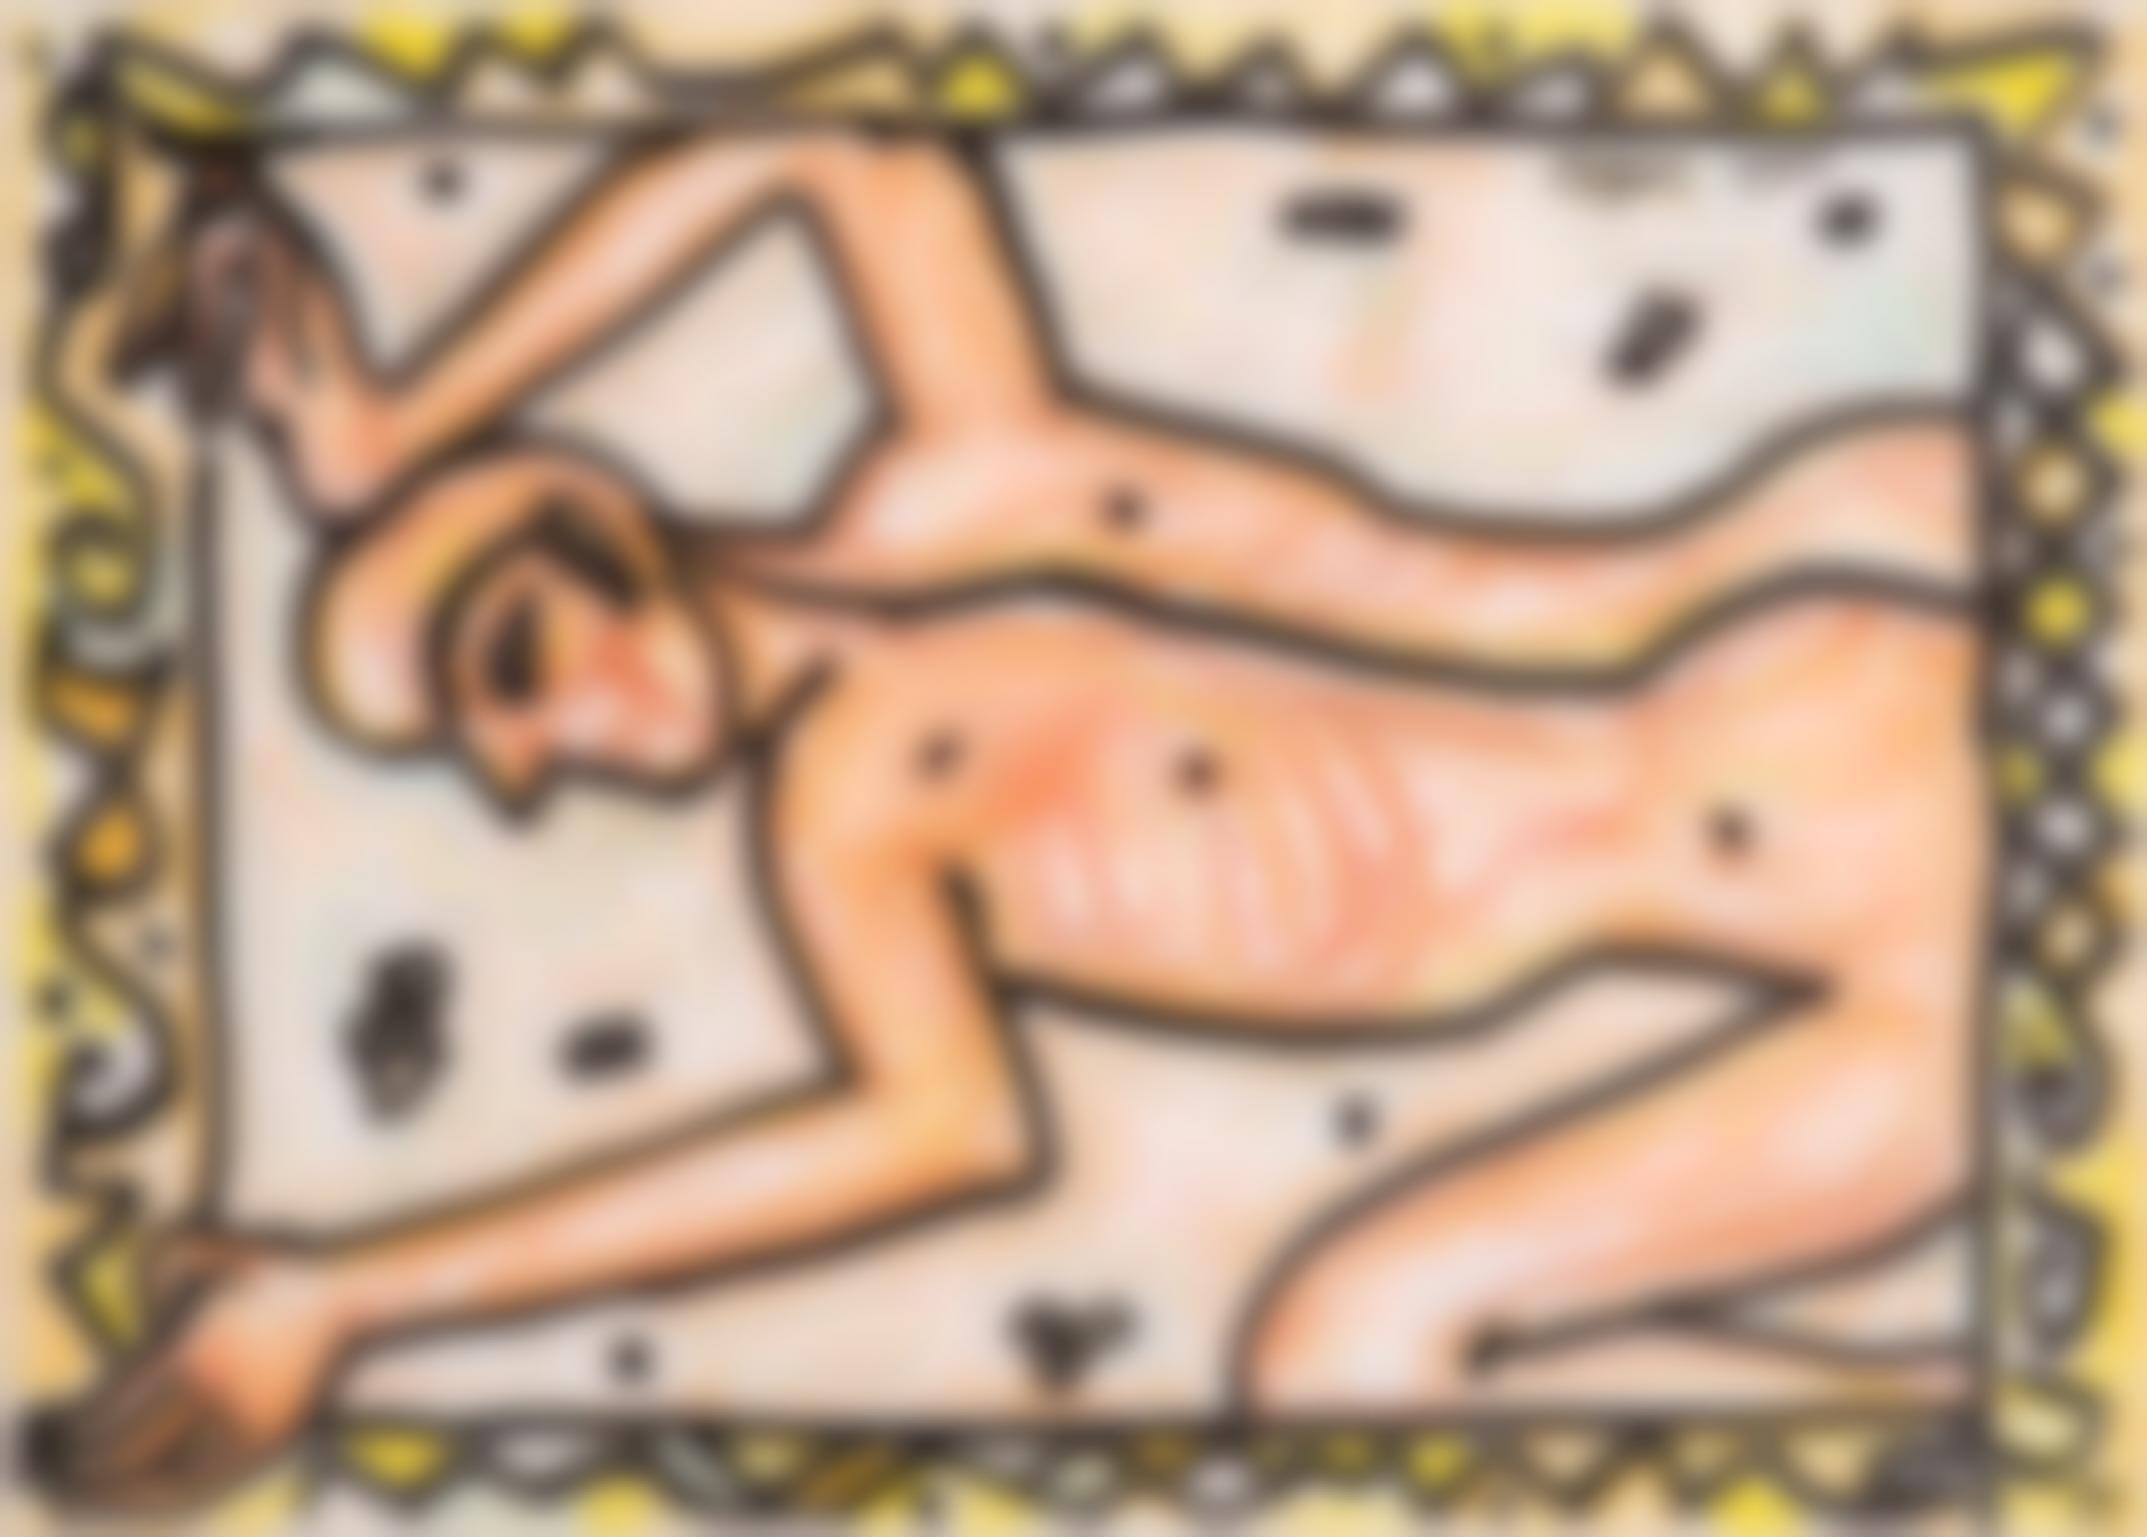 Jogen Chowdhury-Untitled-2007